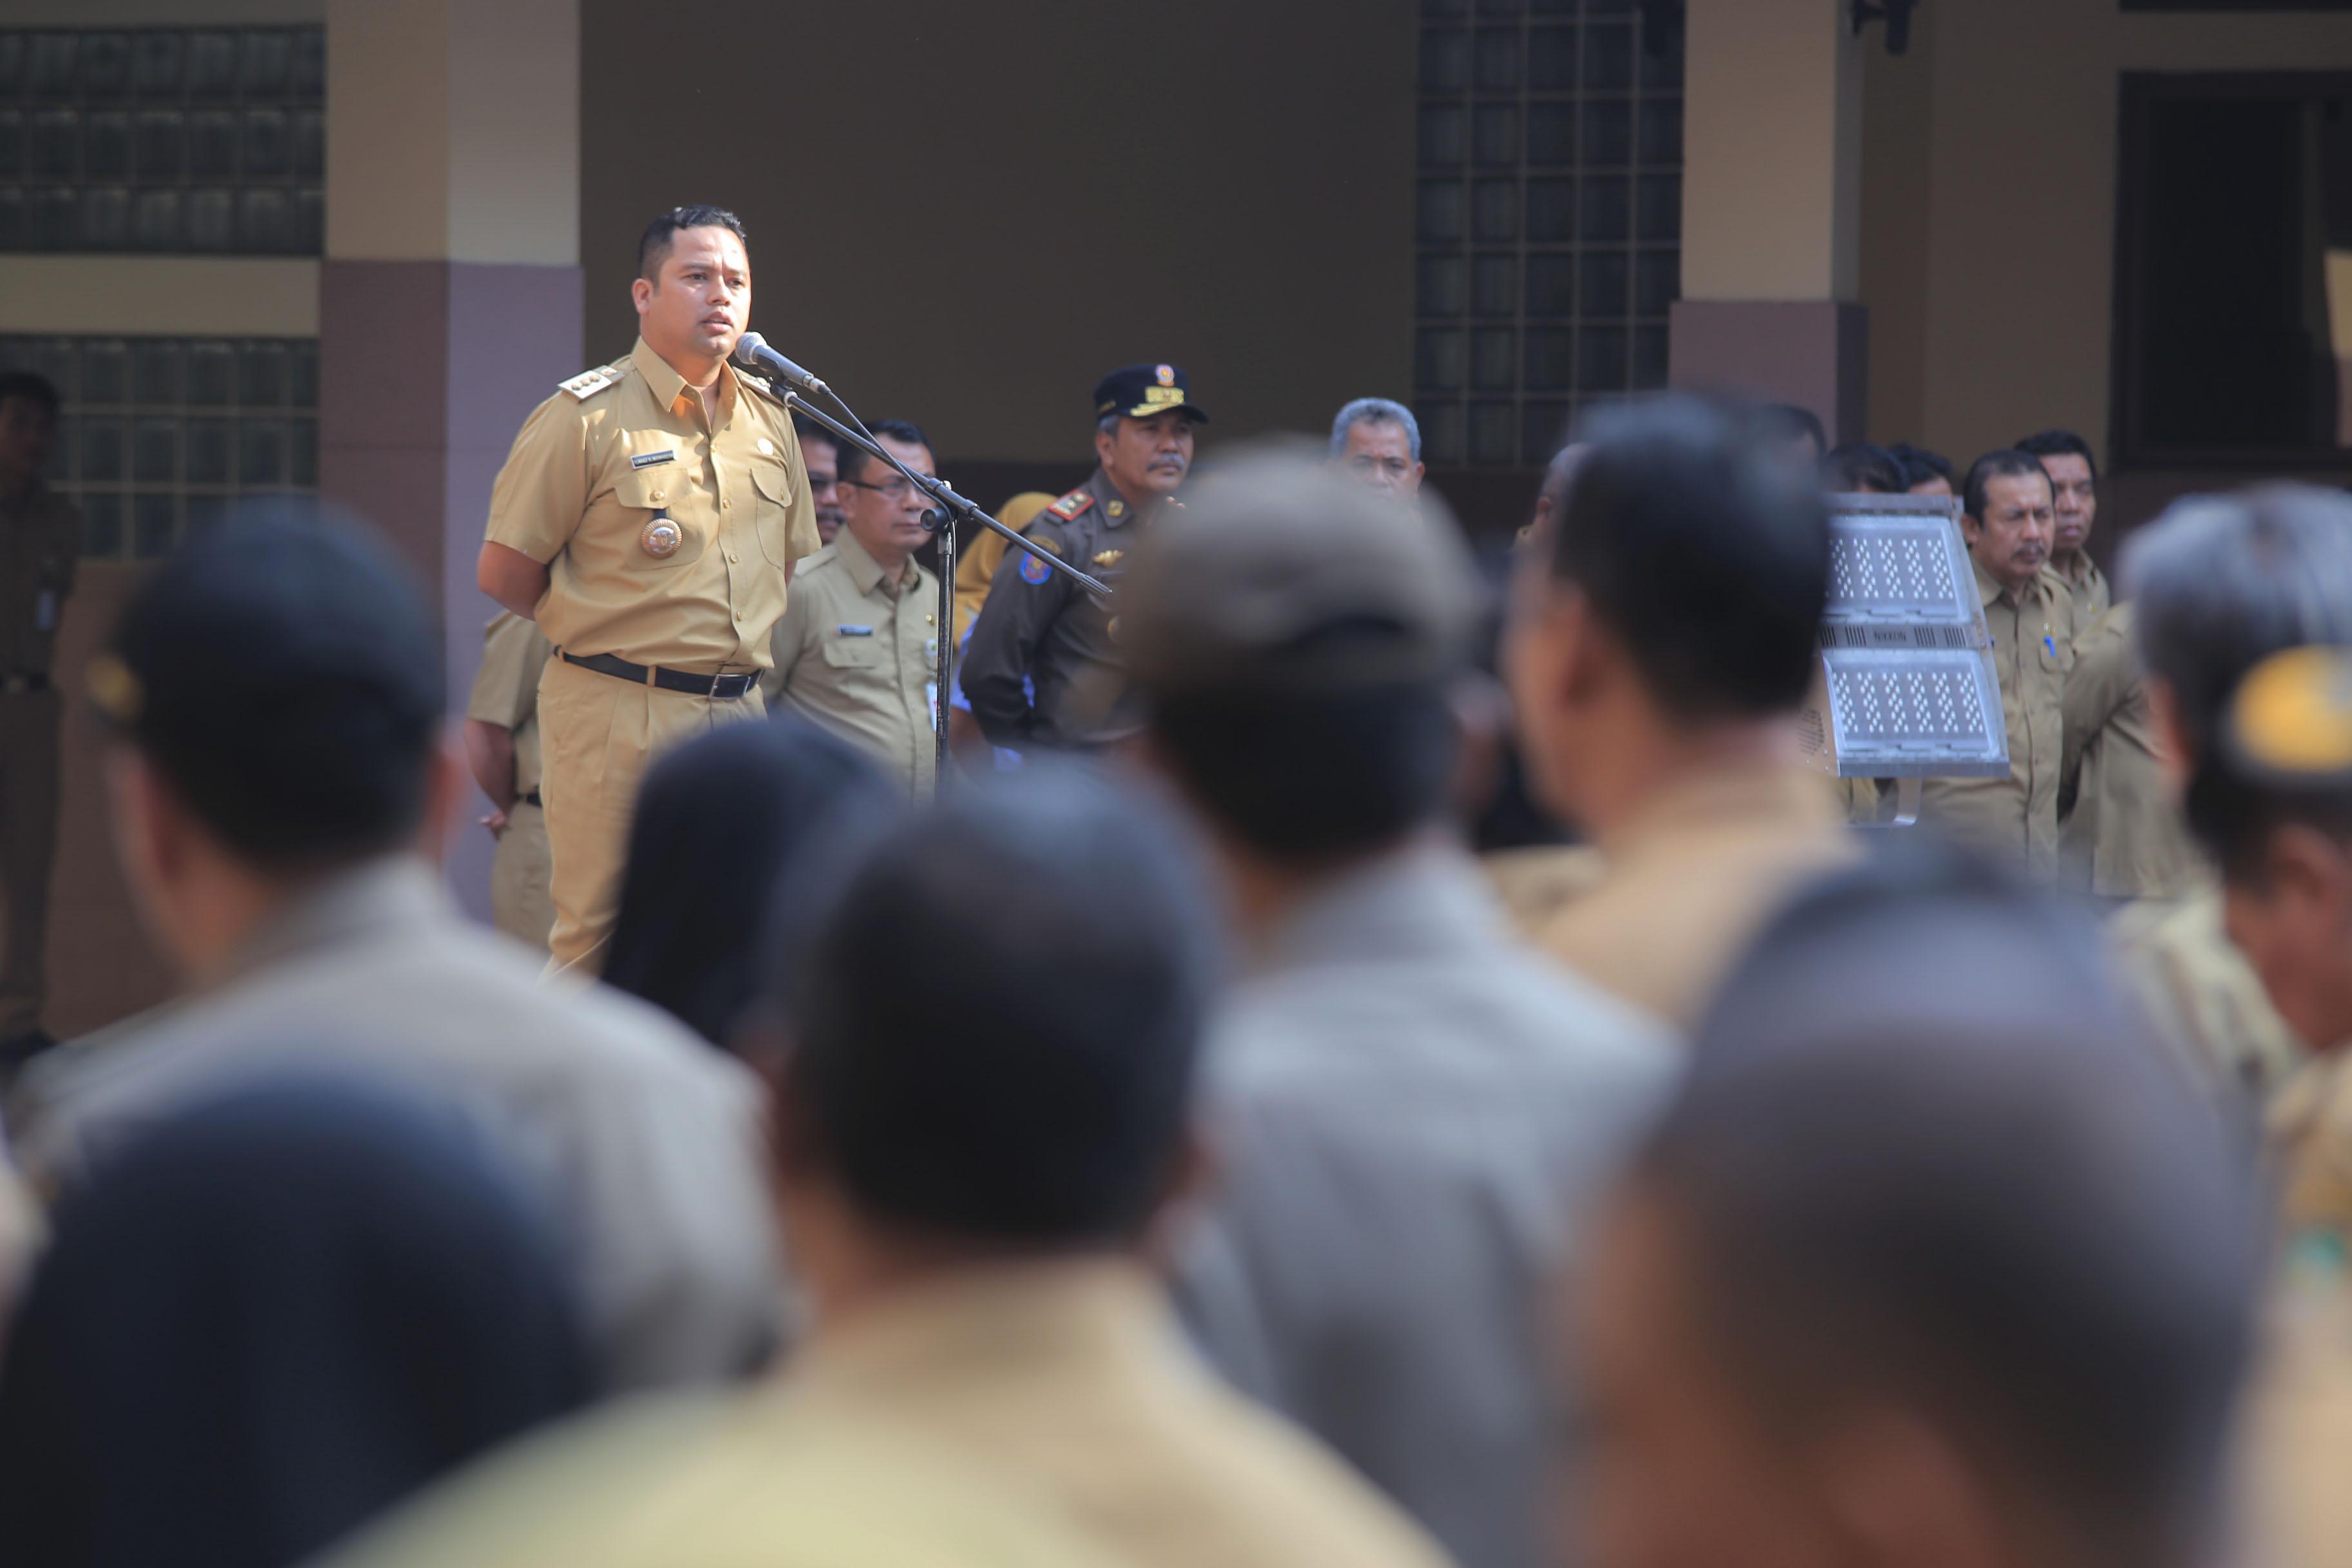 Pimpin Apel Pagi, Arief Bahas Revolusi Industri 4.0 hingga Sampah yang Masih Numpuk di Kantor Kecamatan